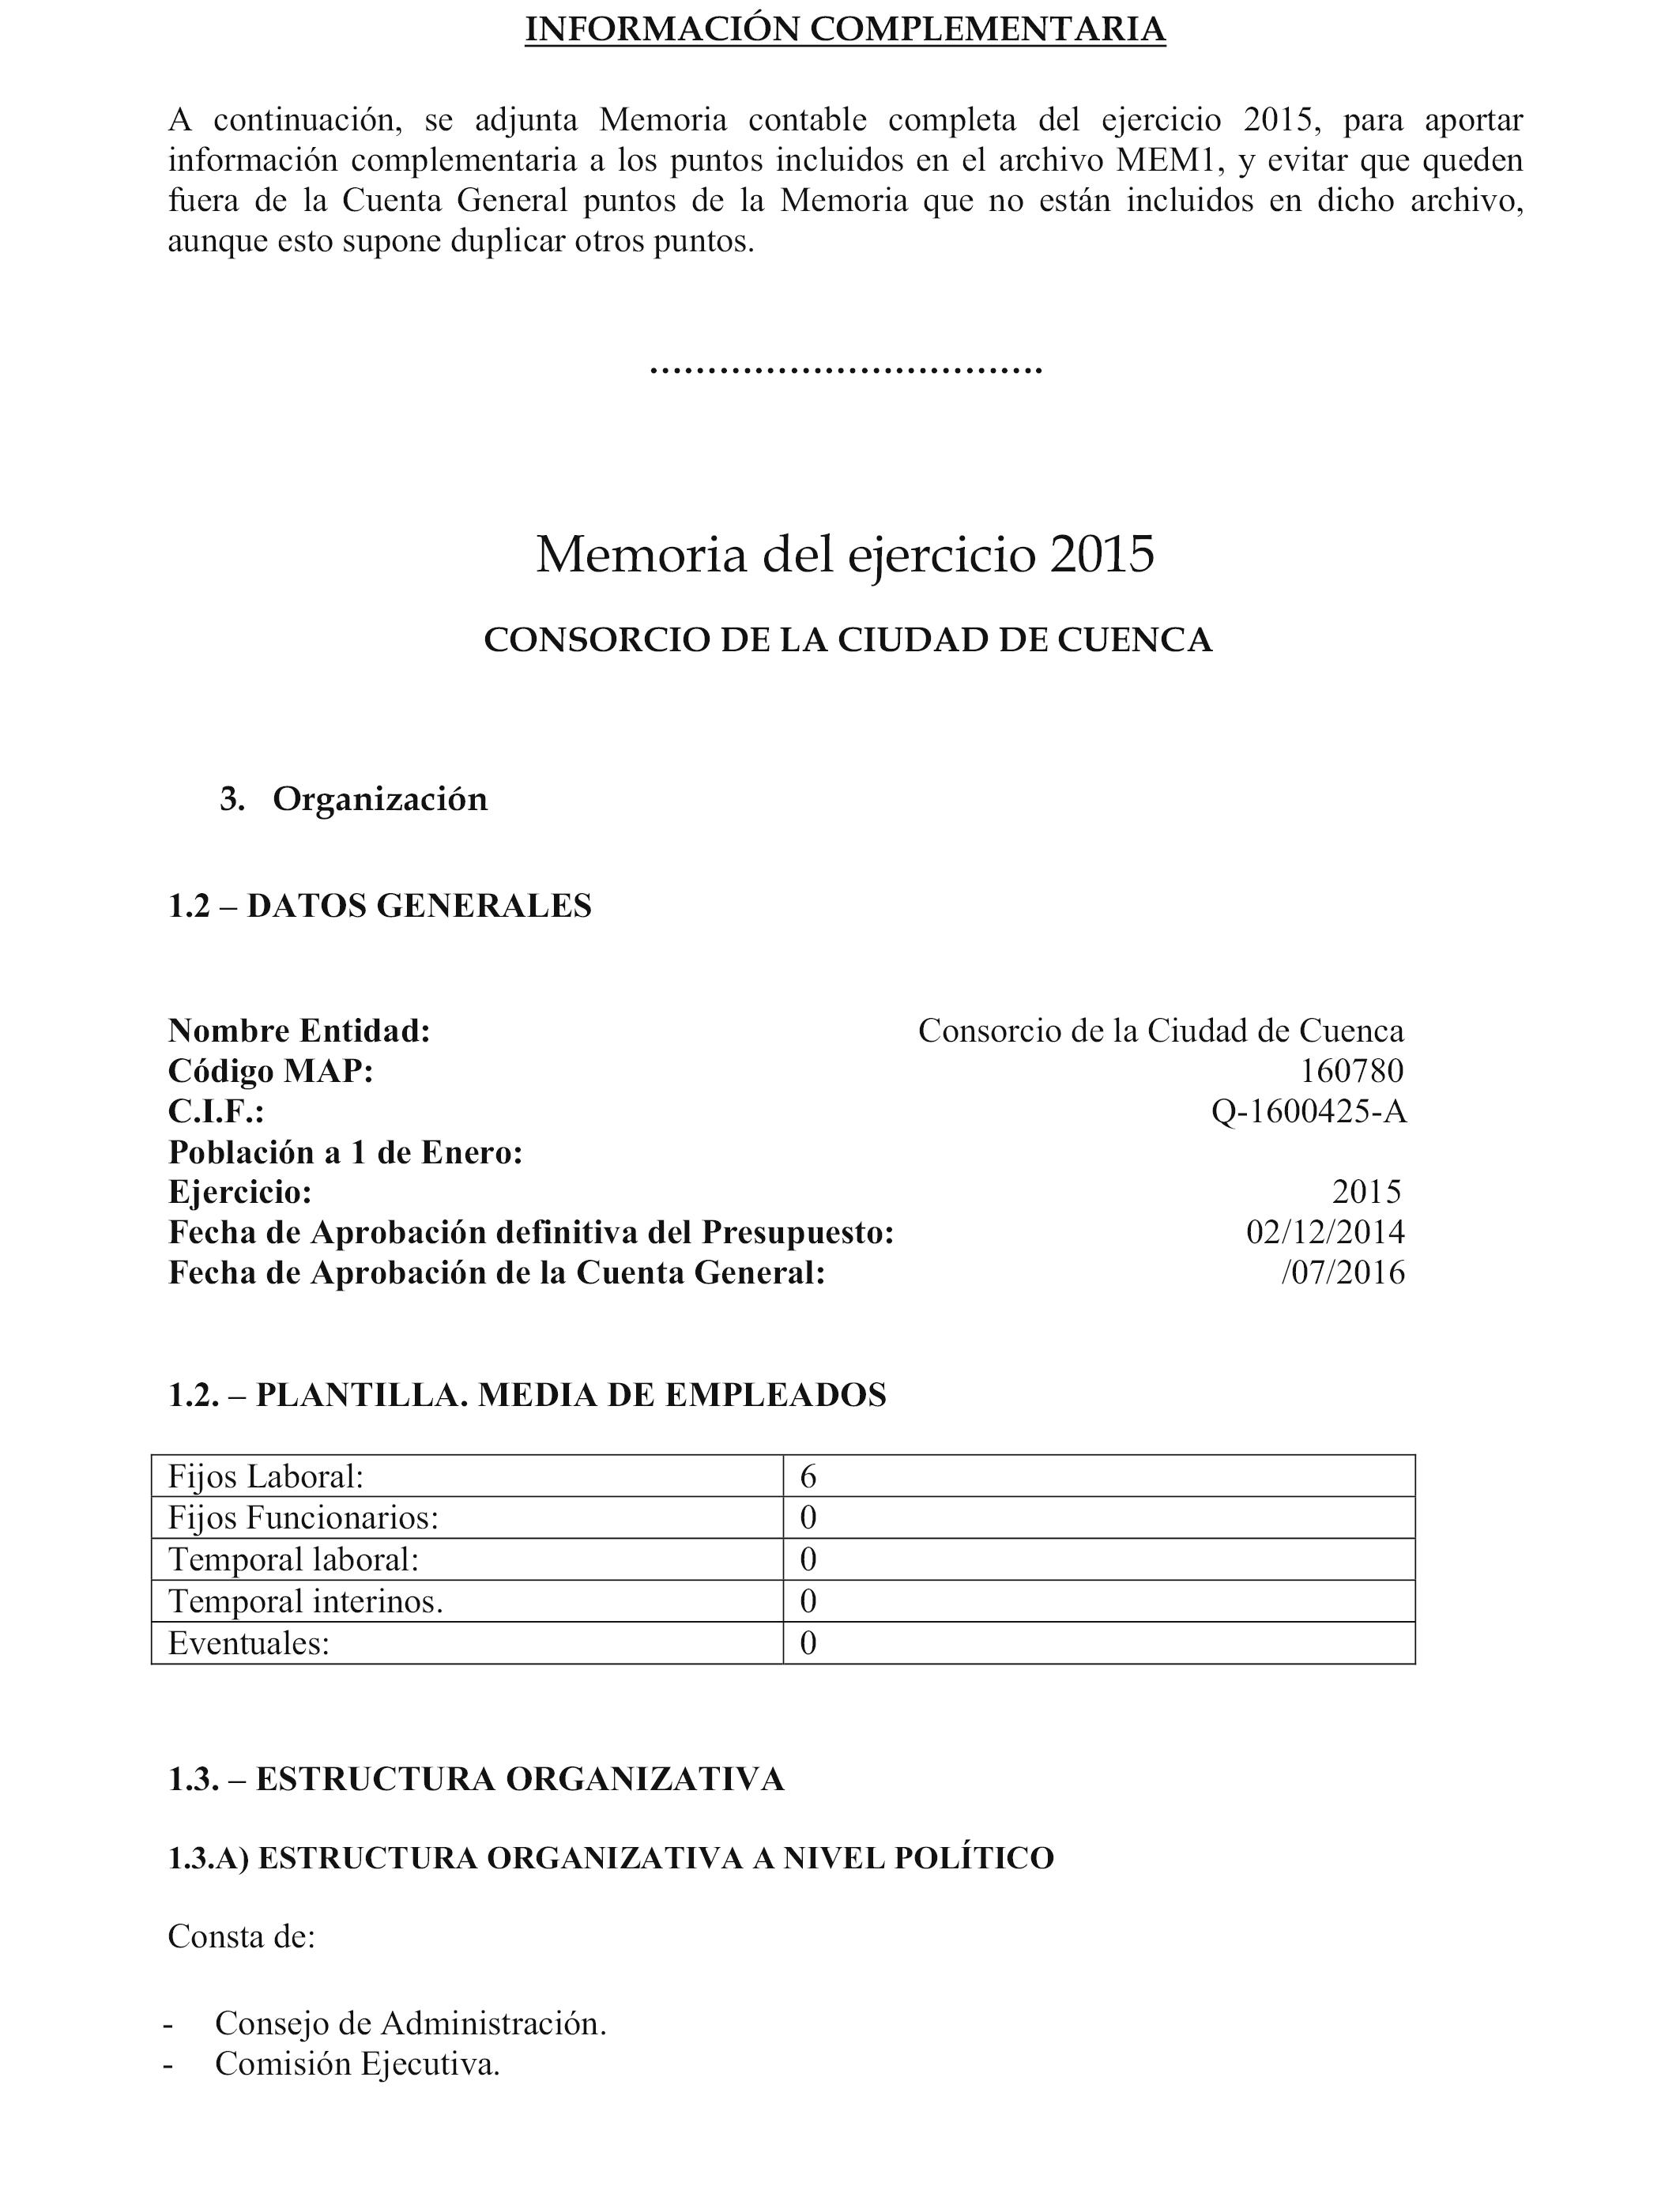 BOE.es - Documento BOE-A-2016-8082